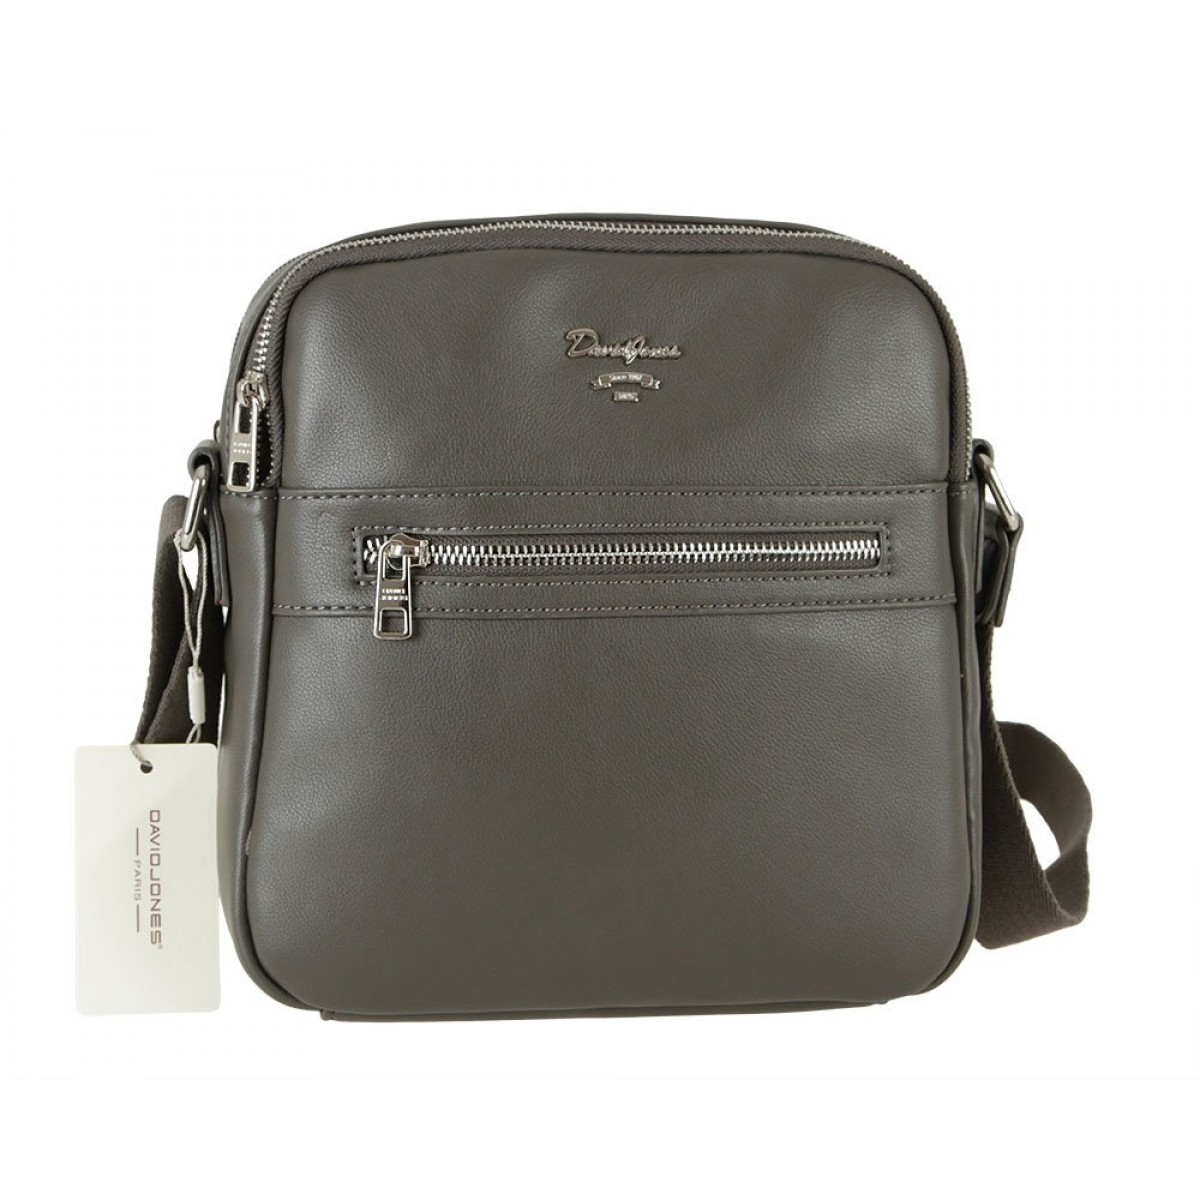 Жіноча сумка David Jones 698801 D.GREY